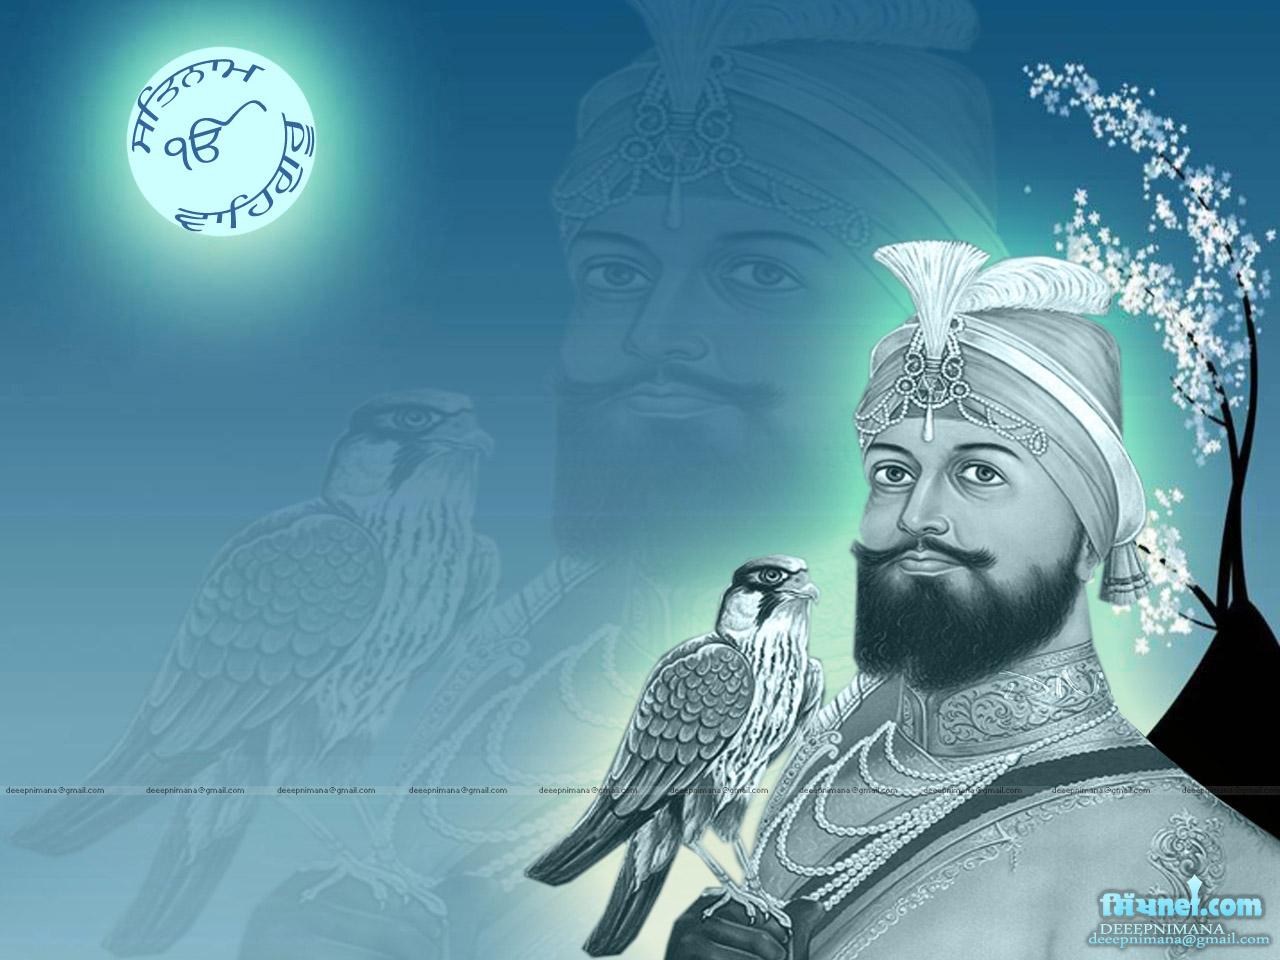 Trololo blogg sikh photos wallpaper hd - Shri guru gobind singh ji wallpaper ...